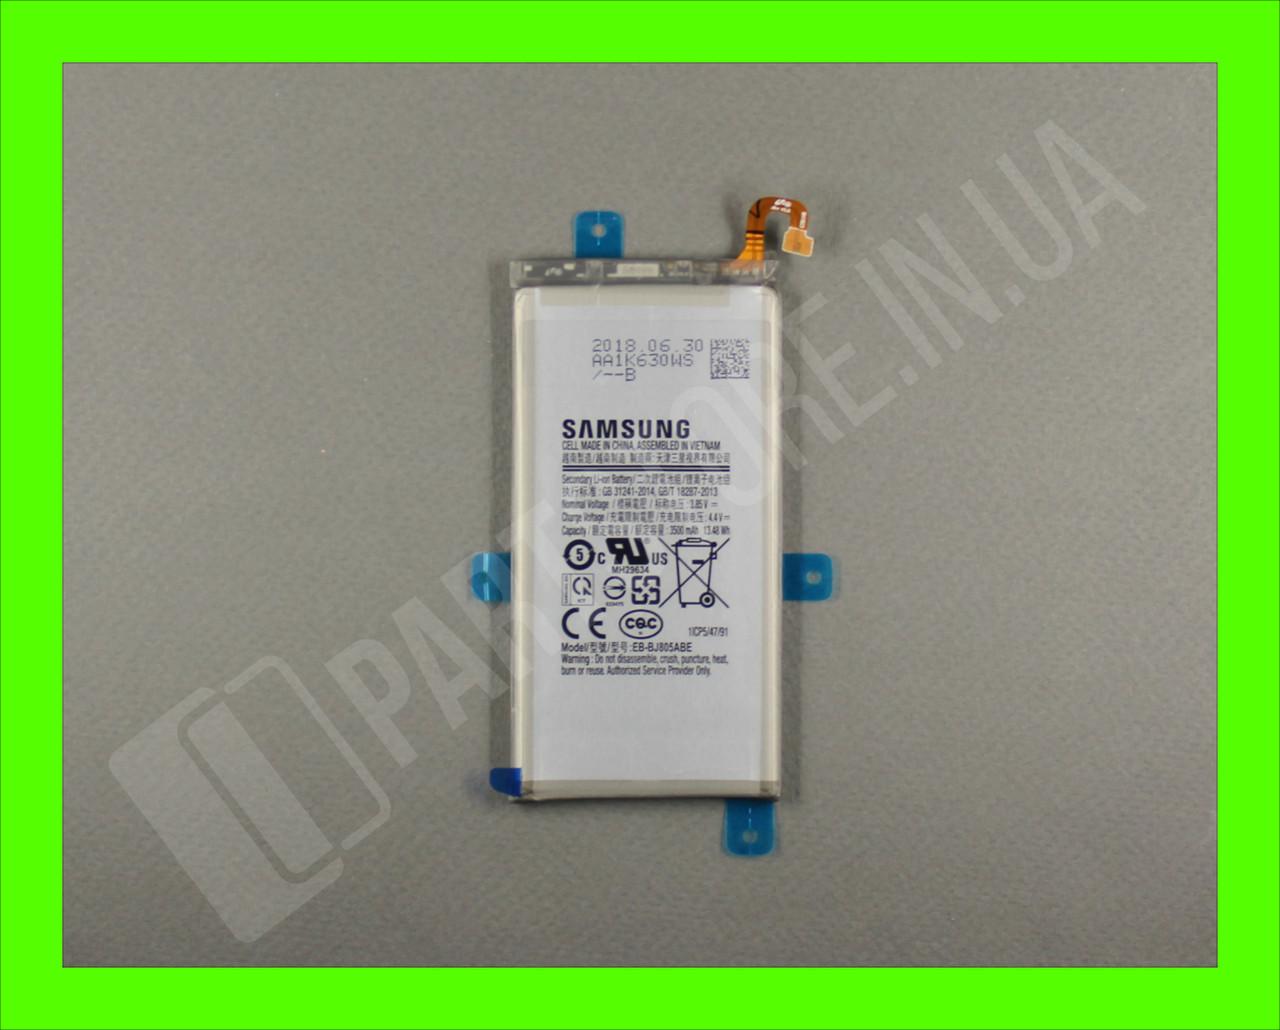 Аккумулятор Samsung j810 j8 2018 (EB-BJ805ABE) GH82-17246A сервисный оригинал